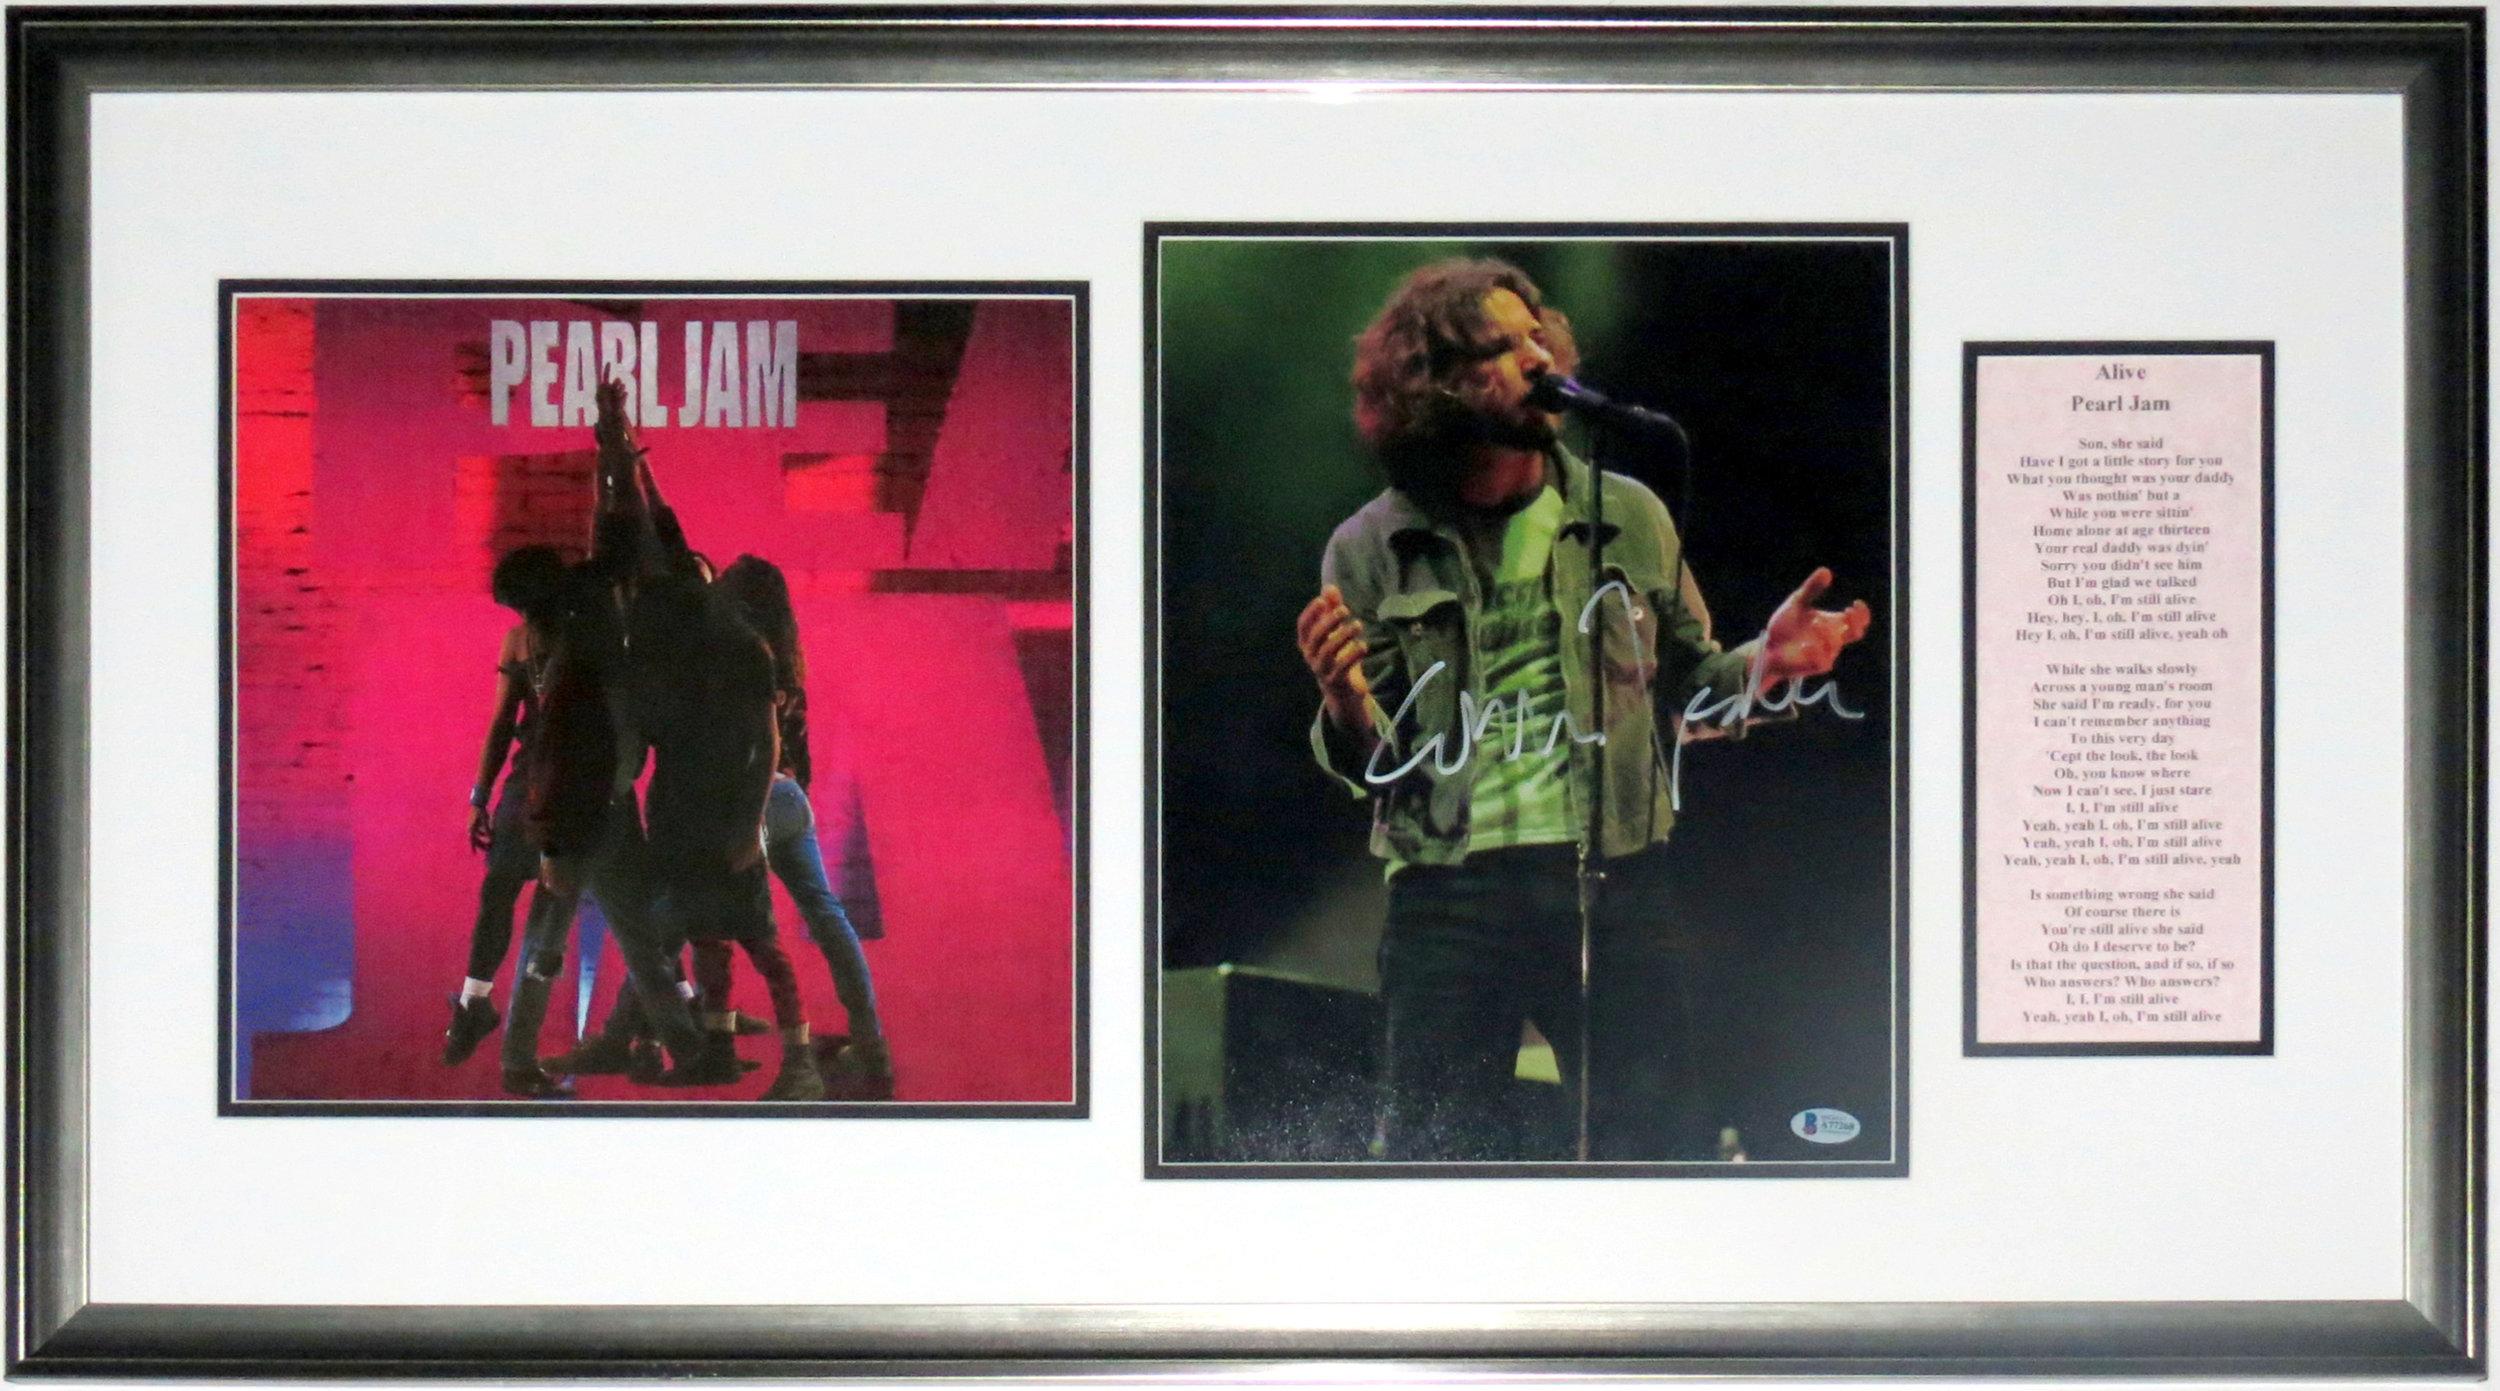 Eddie Vedder Signed Pearl Jam Concert 11x14 Photo - Beckett BAS COA Authenticated - Professionally Framed & Ten Album & Alive Lyrics